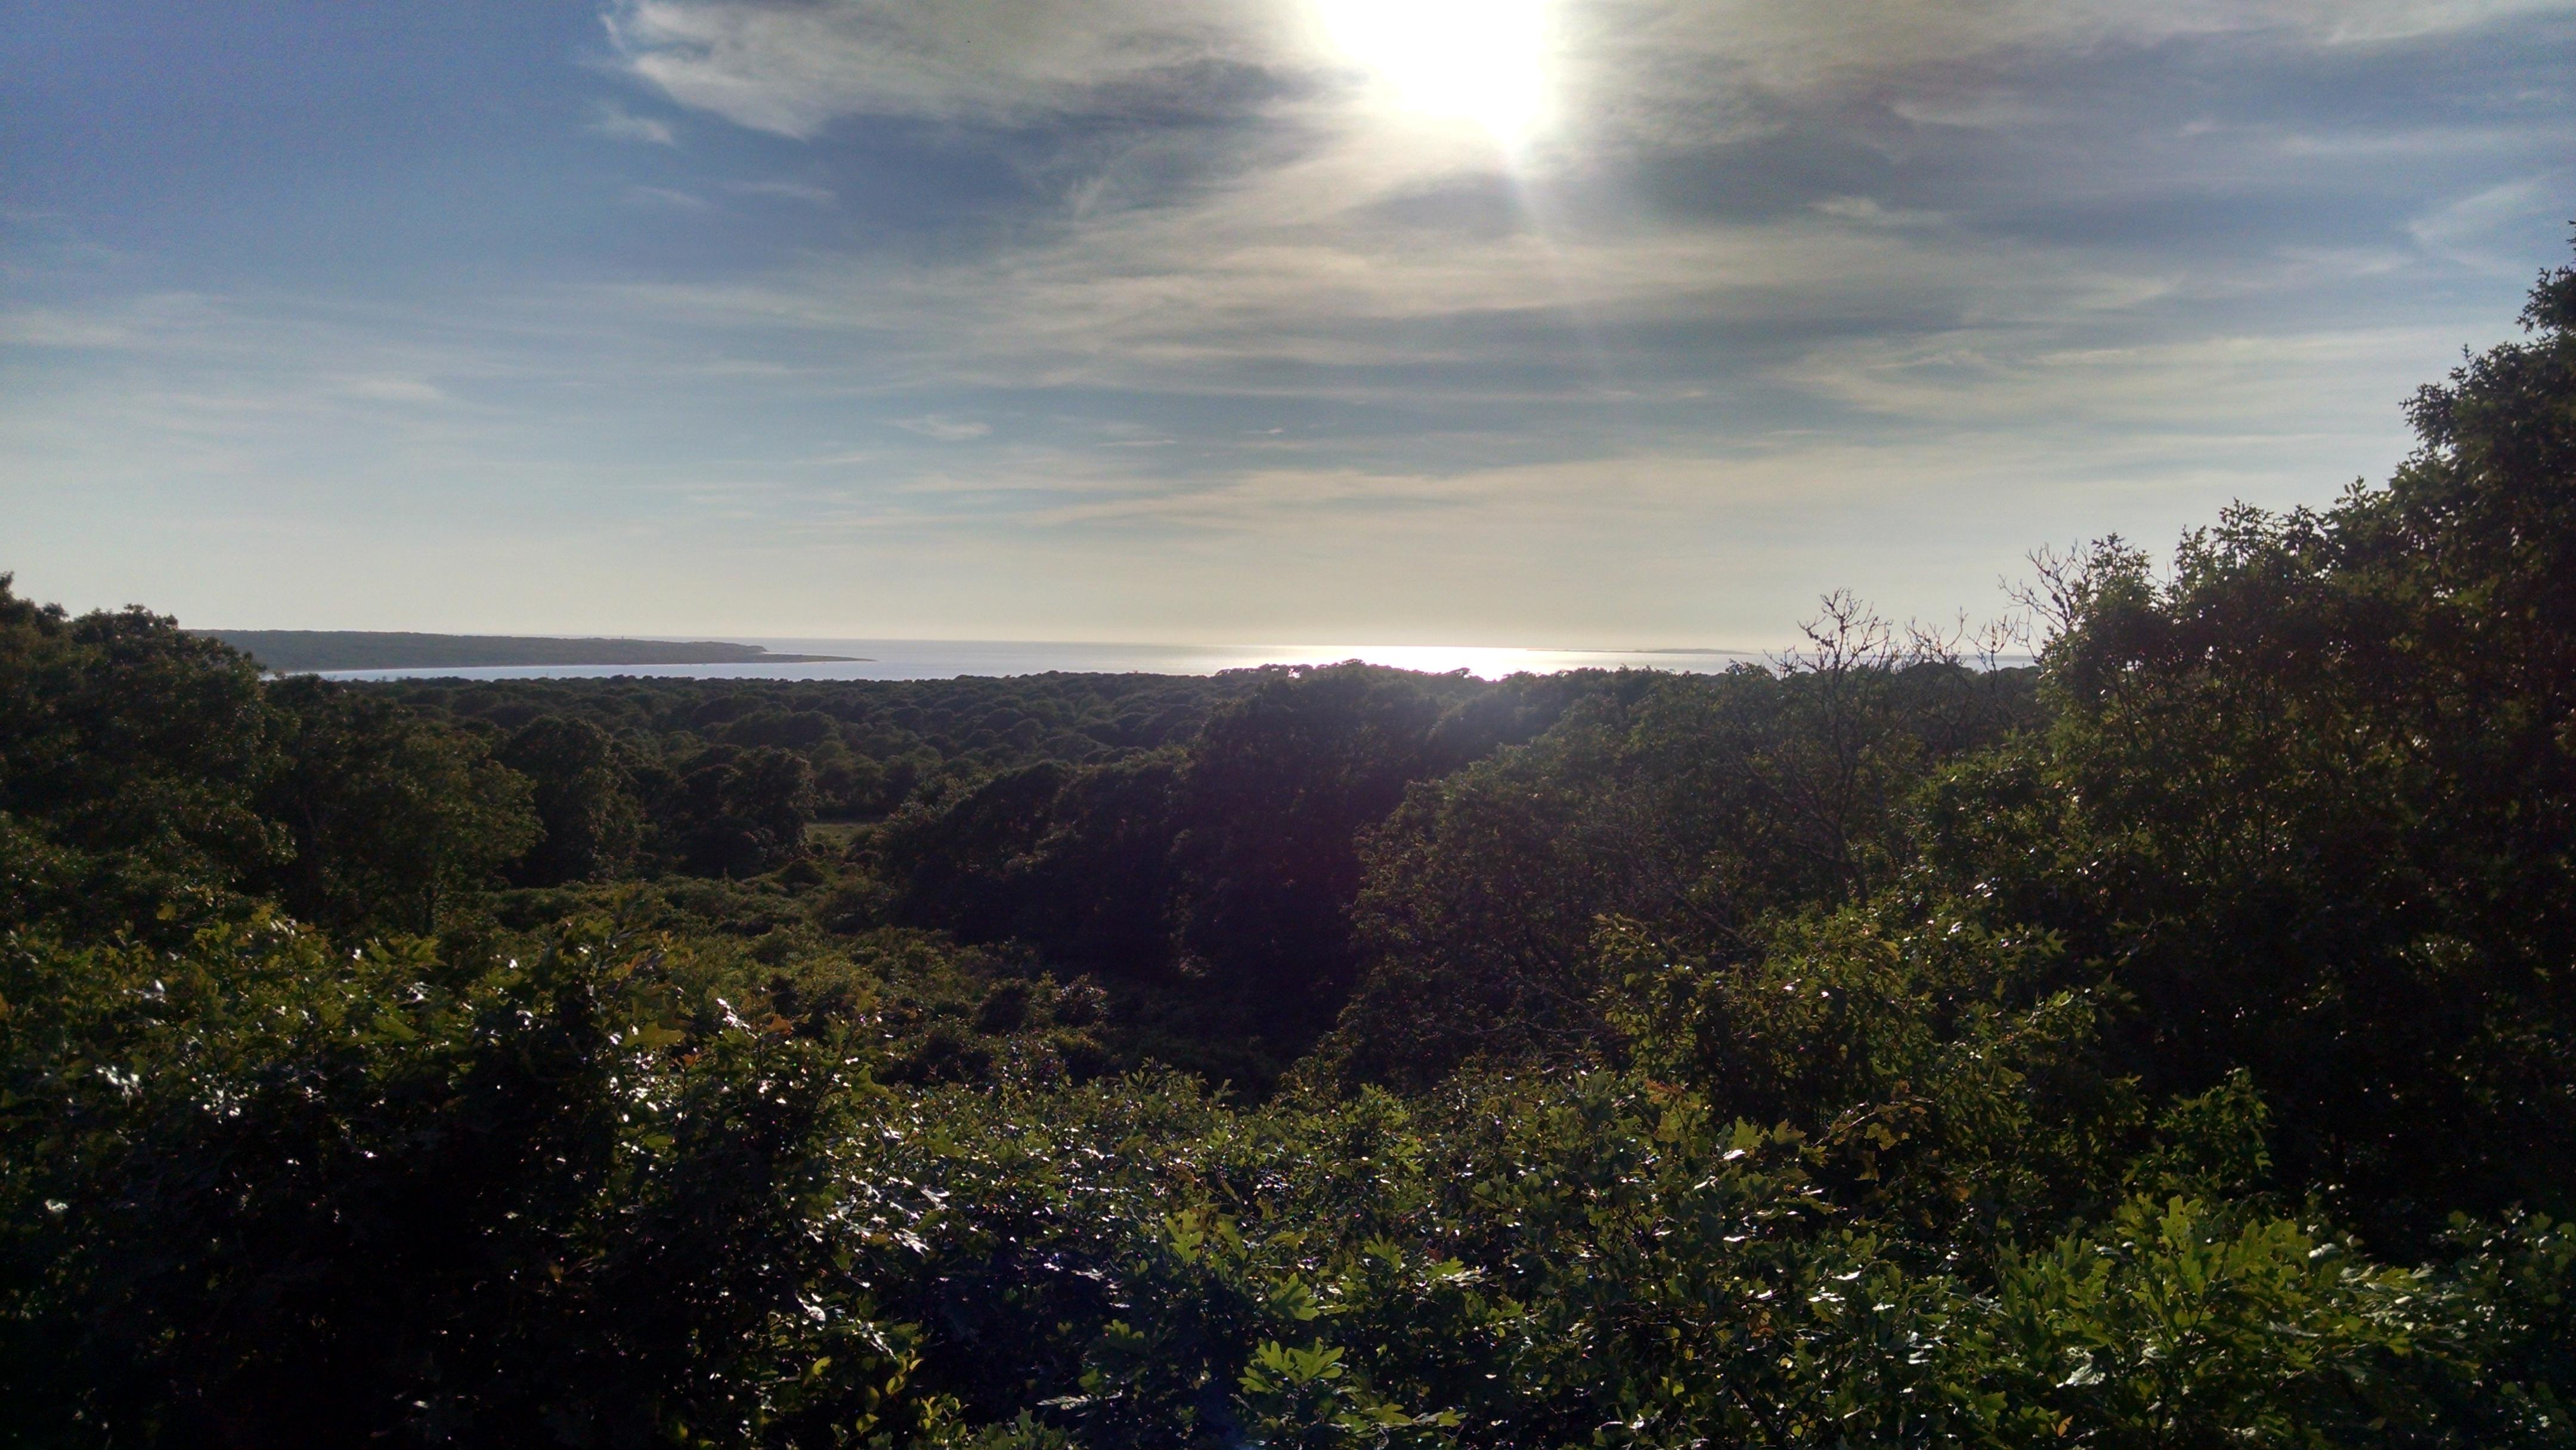 Menemsha Hill View